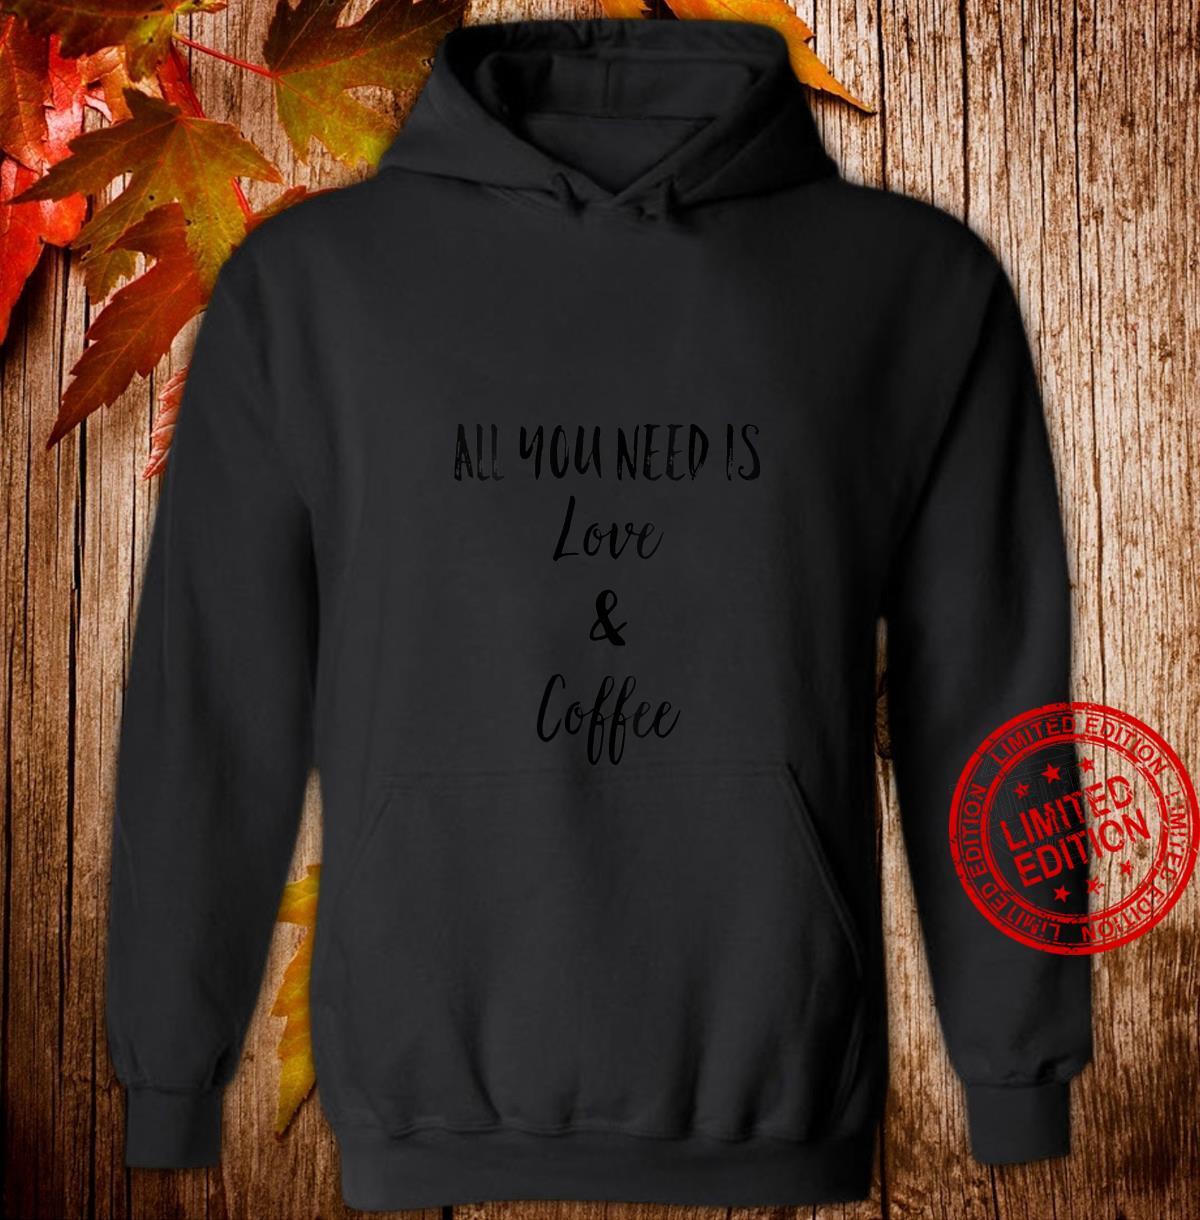 Womens All You Need is Love and Coffee Shirt,I Like You a Latte Shirt hoodie